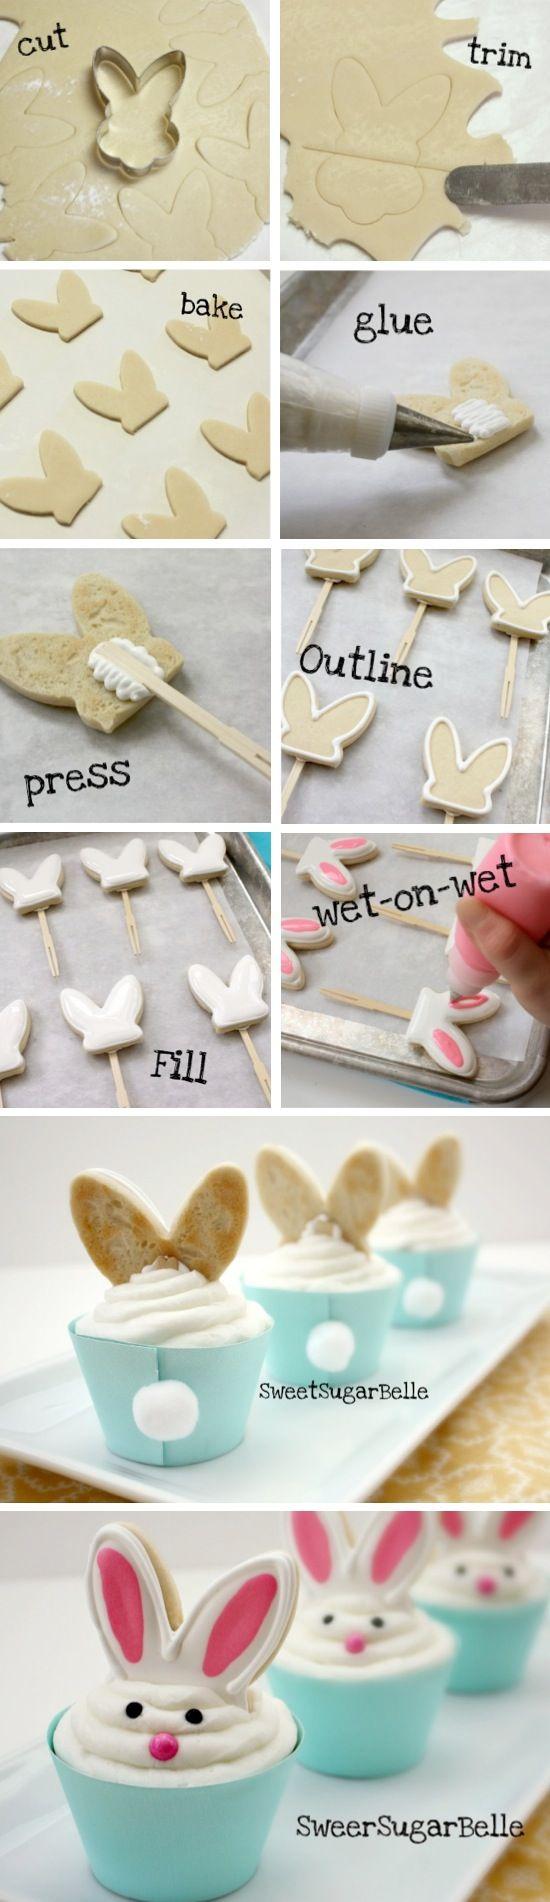 Bunny Ear Cupcakes | Recipe By Photo